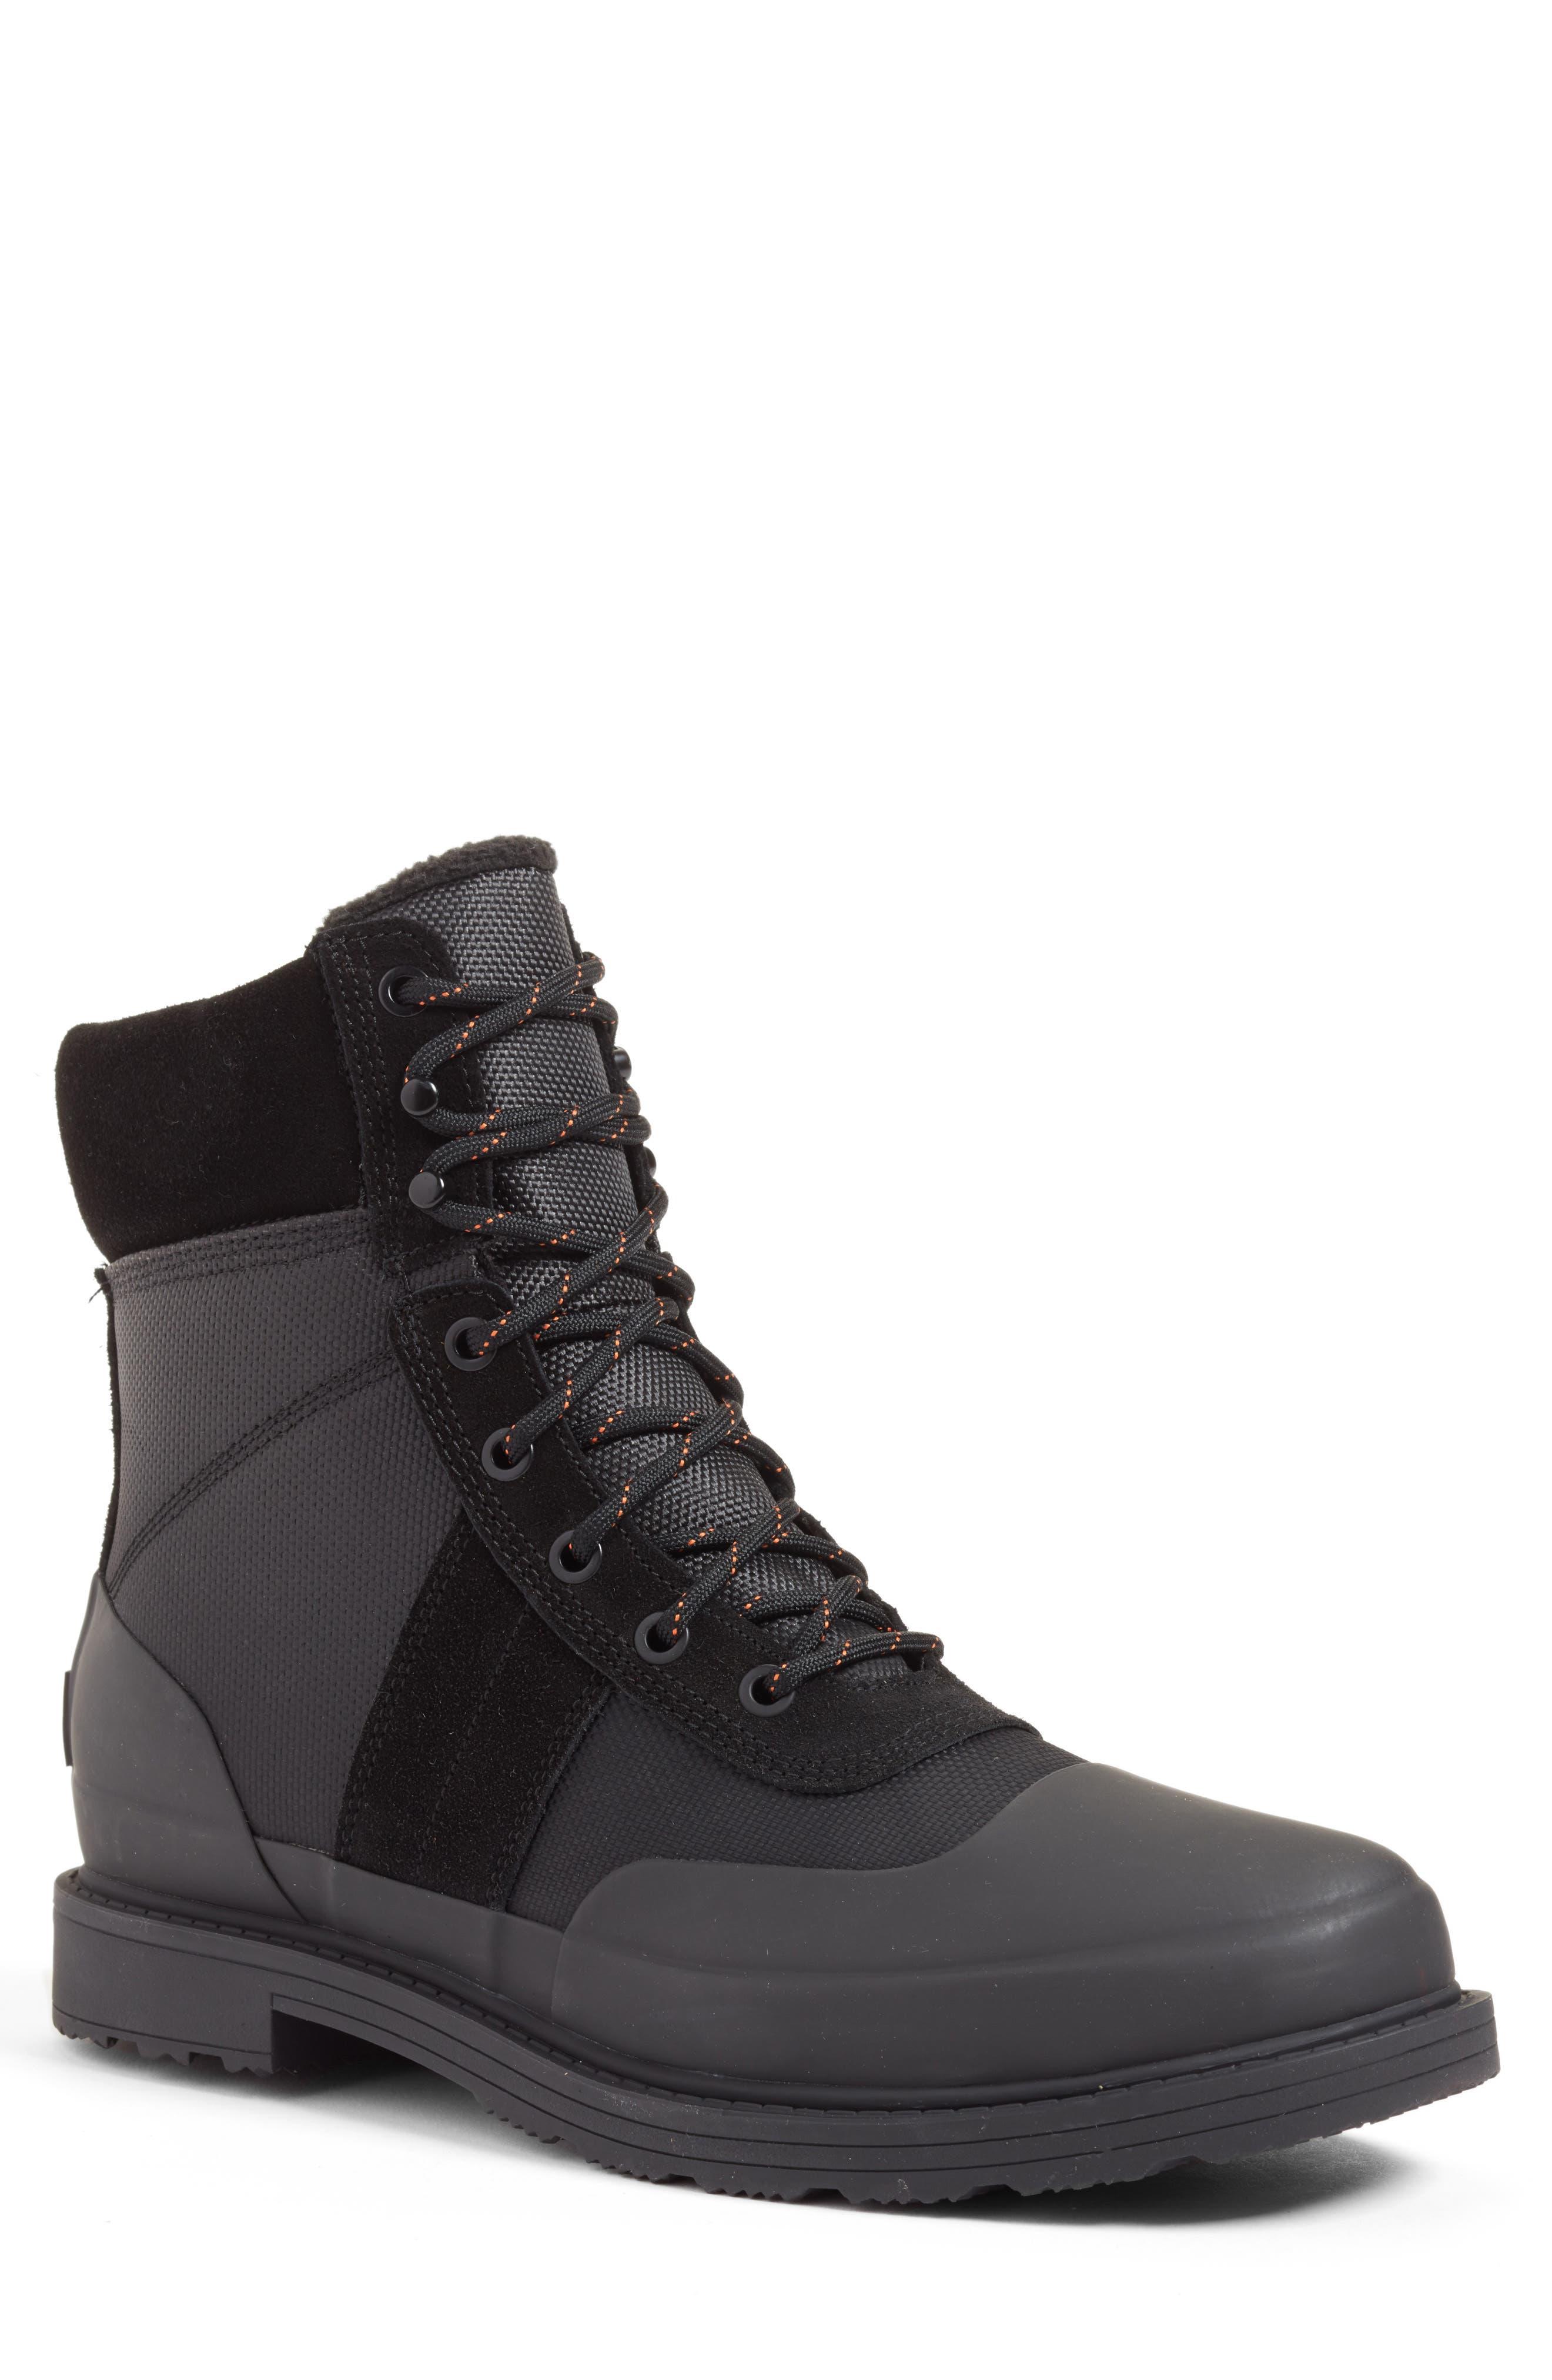 Hunter Original Insulated Commando Boot, Black